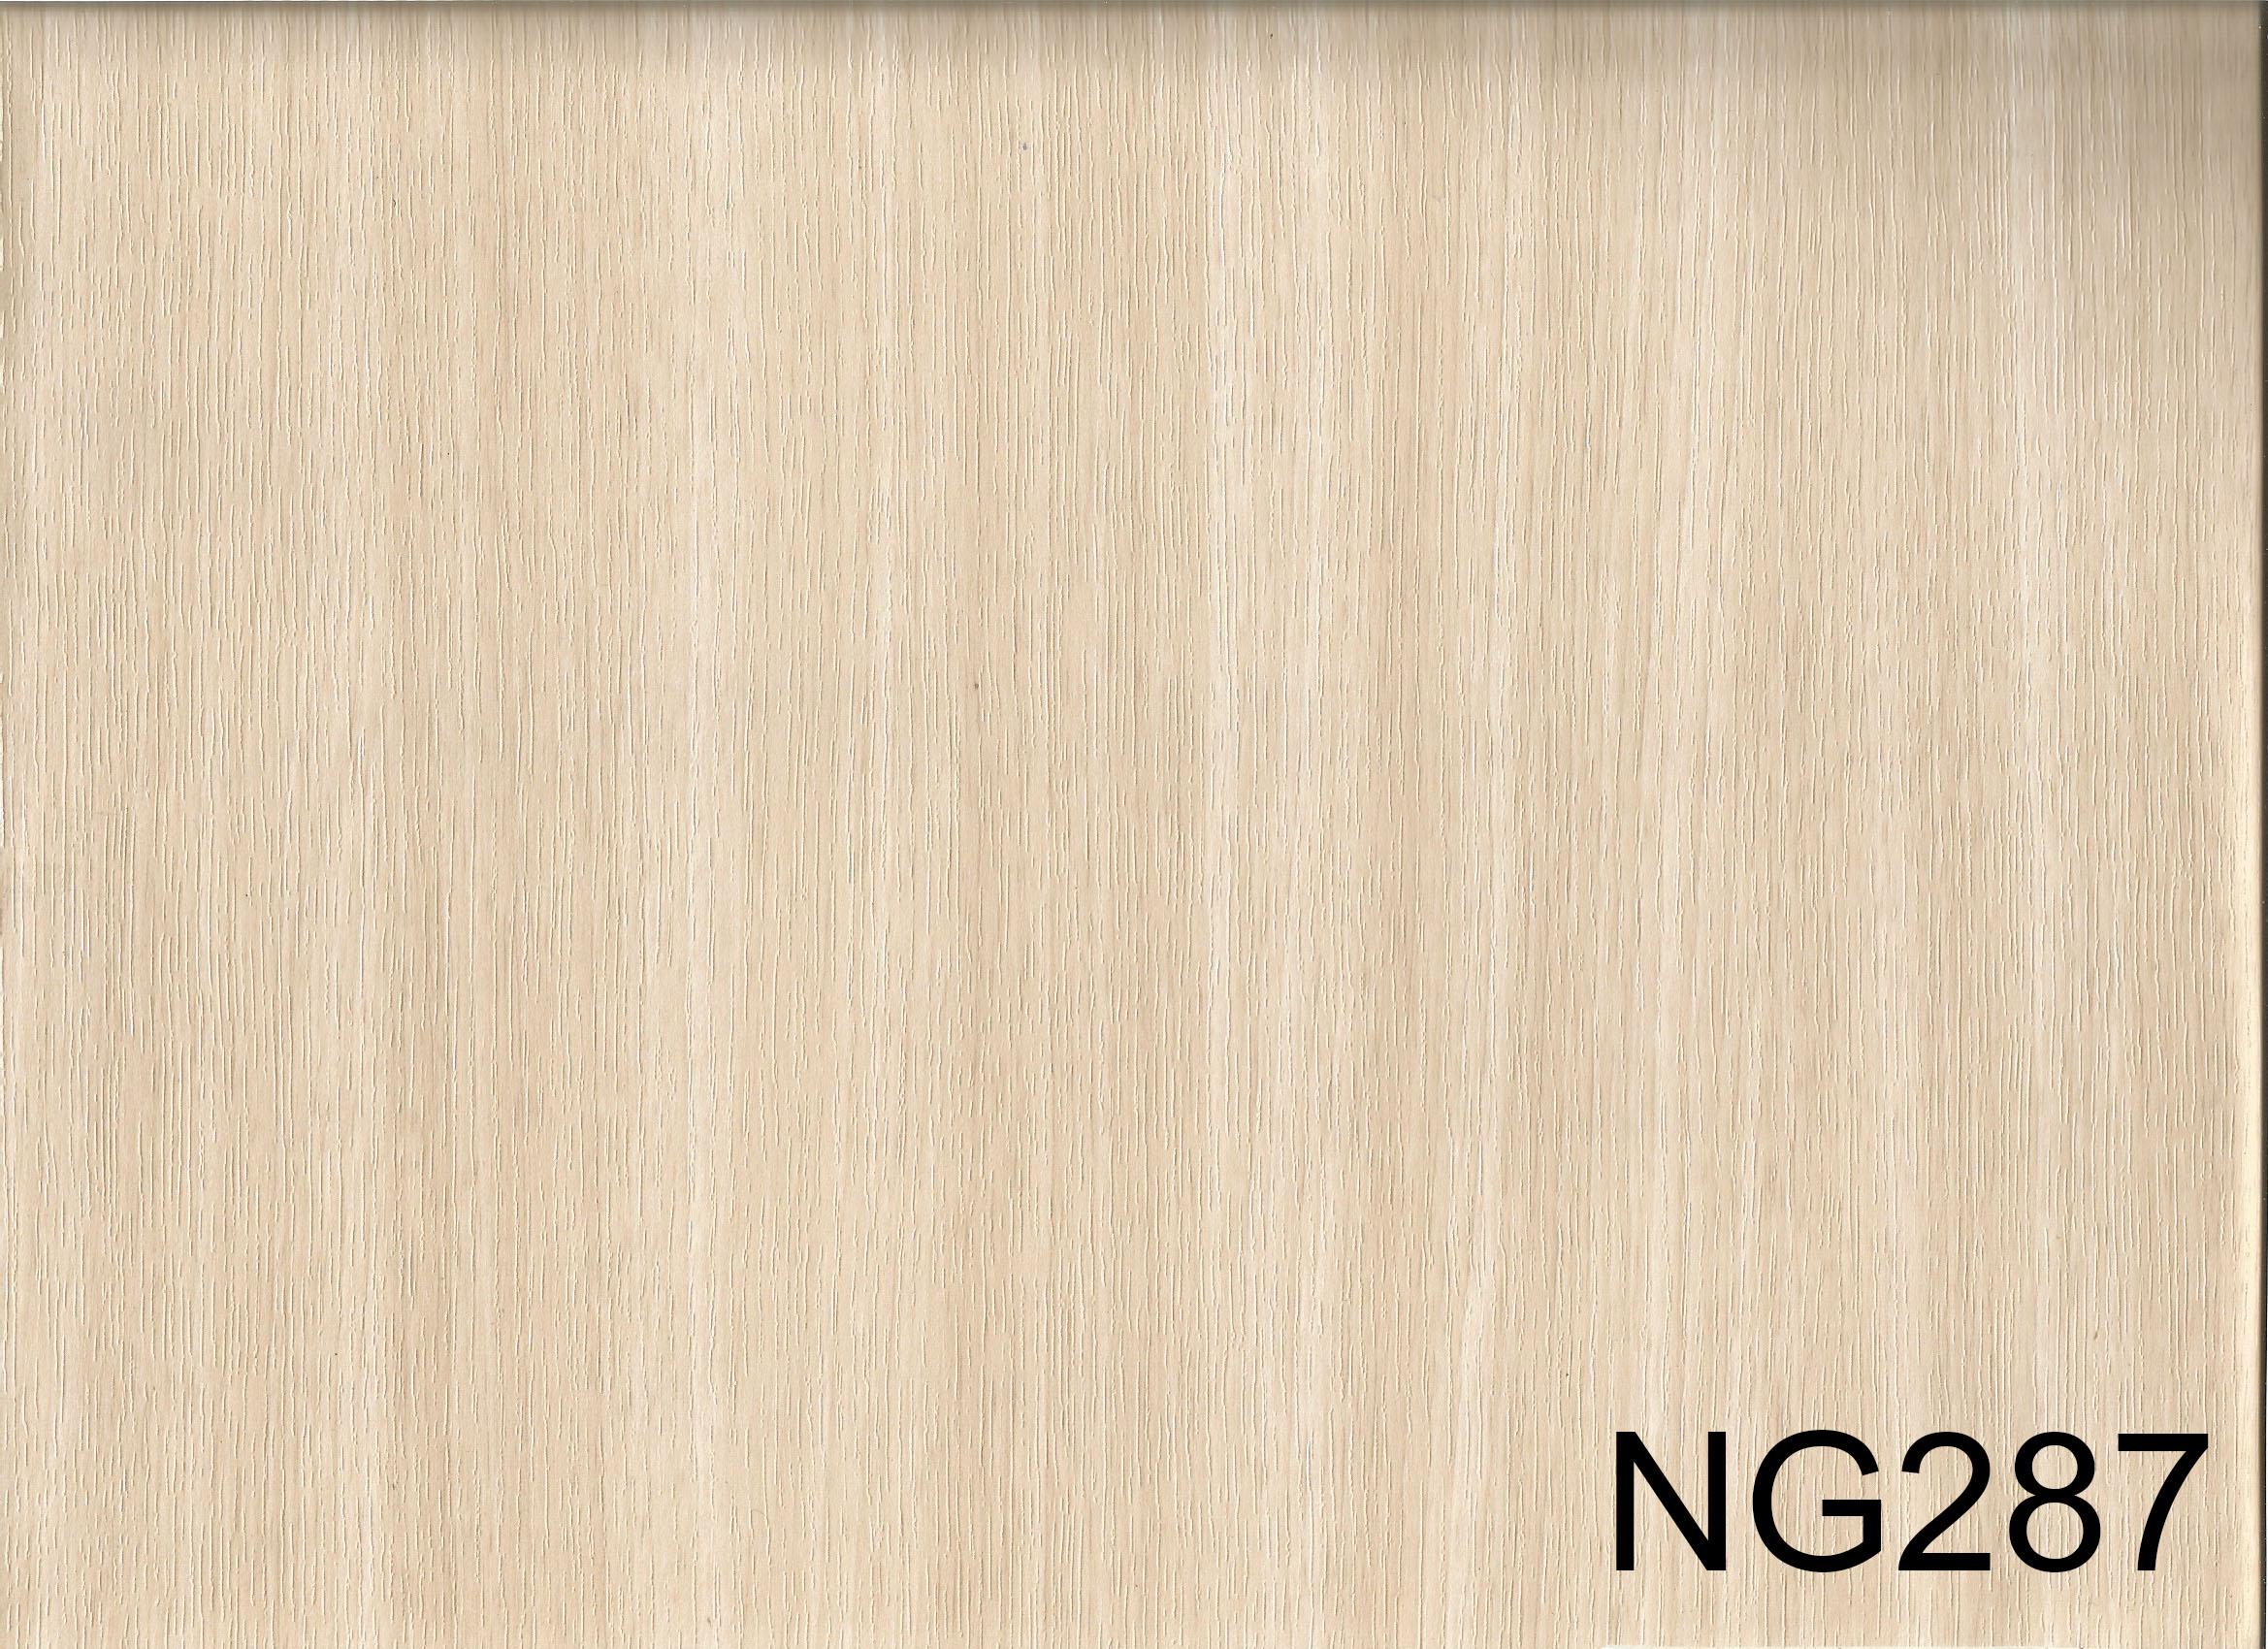 NG287